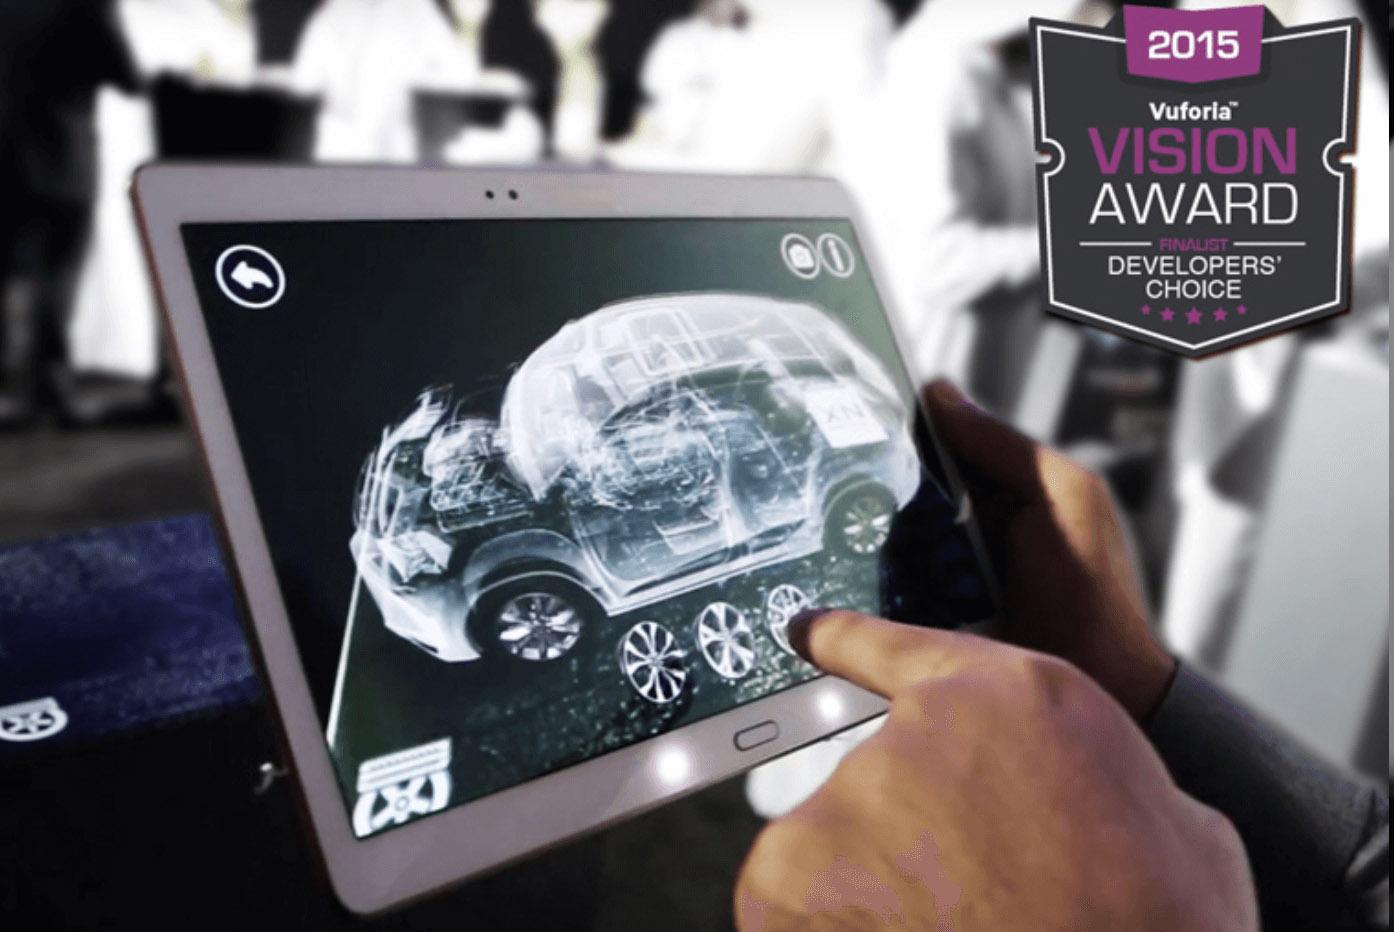 Unity Worldwide Developer's Choice Award